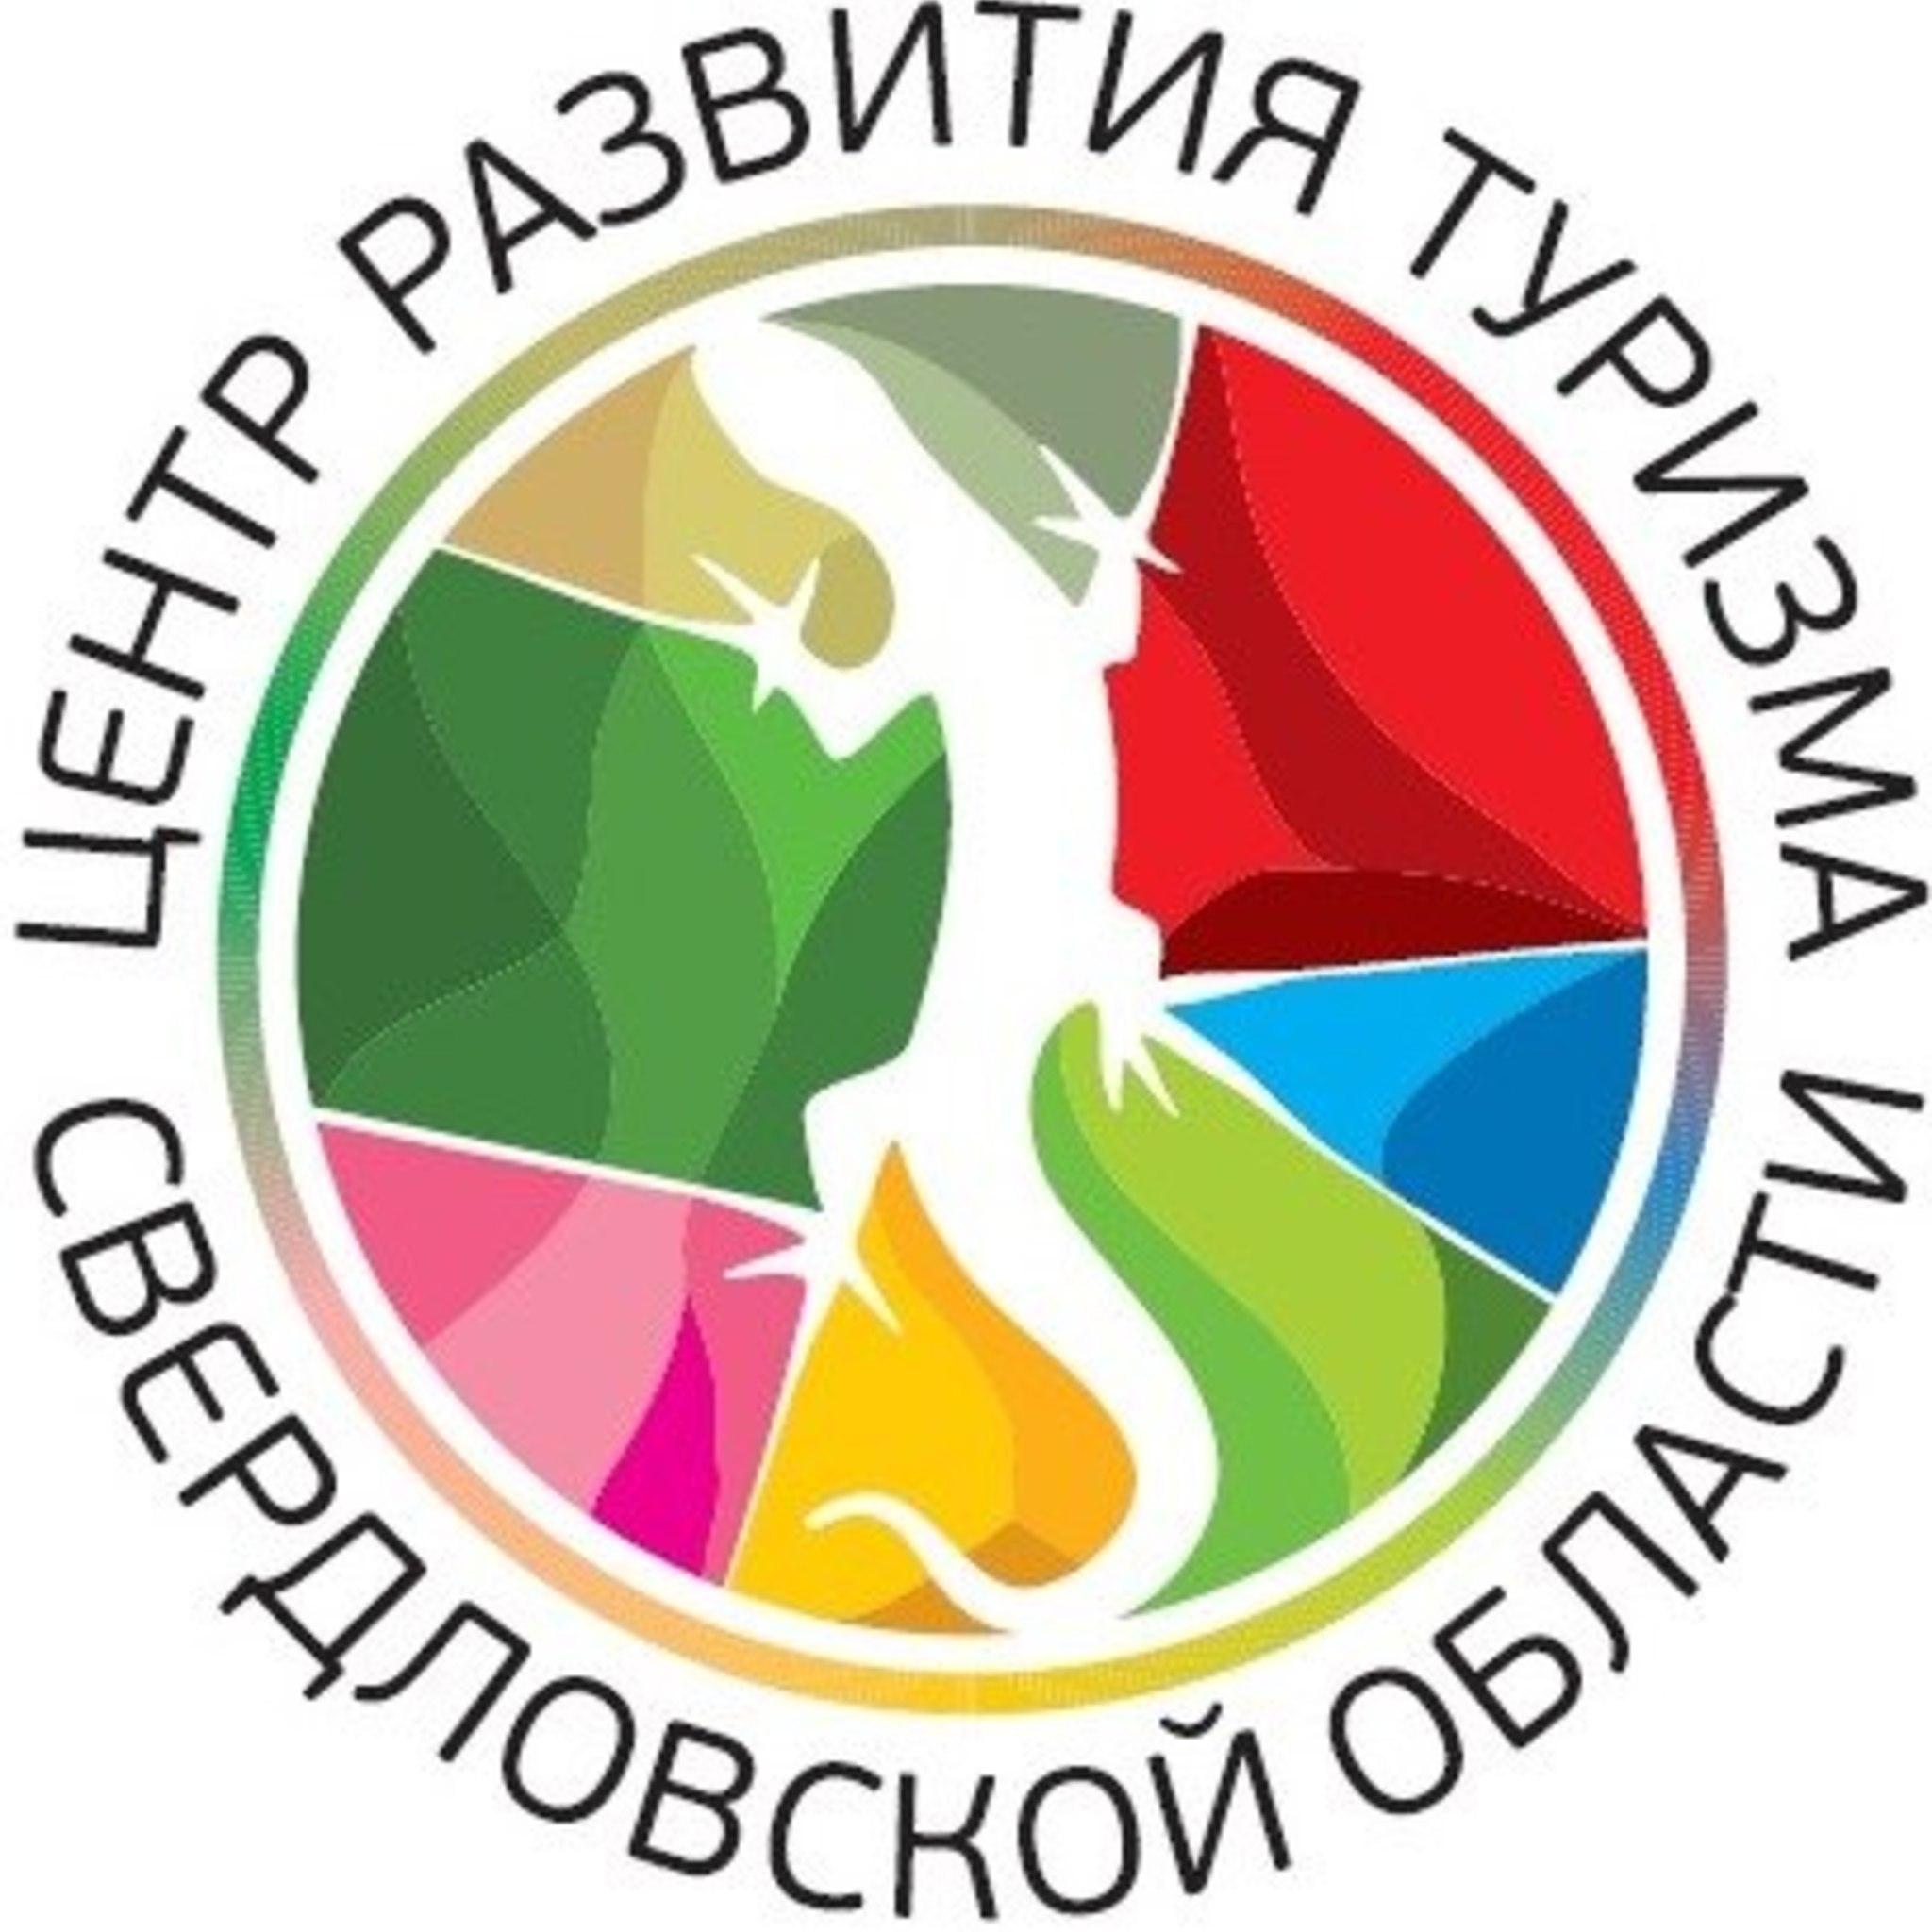 The centre of development tourism of Sverdlovsk region